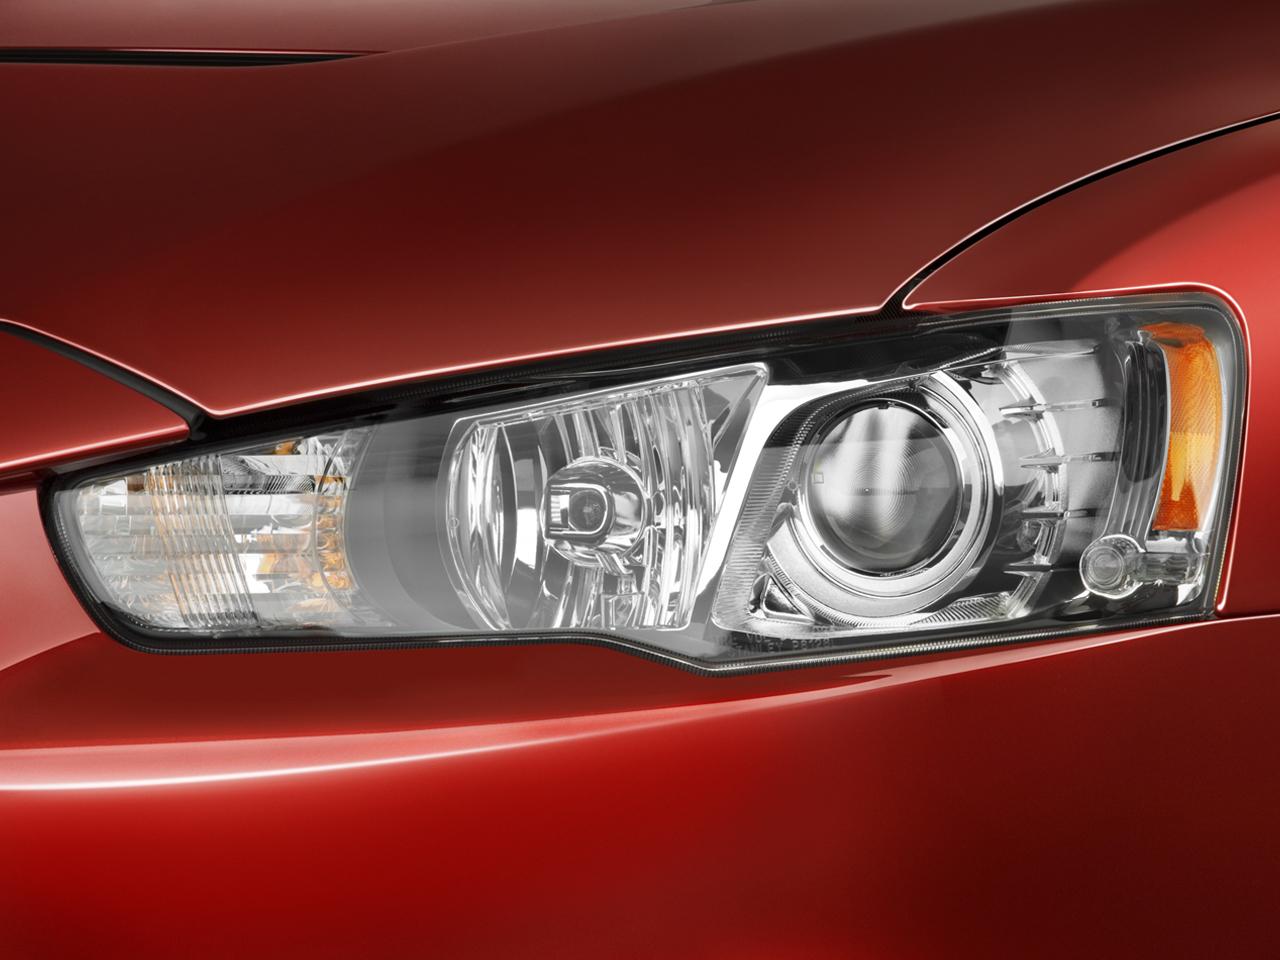 Spy Shots: 2008 Mitsubishi Lancer Ralliart - Latest News, Features, and Spy Shots - Automobile ...